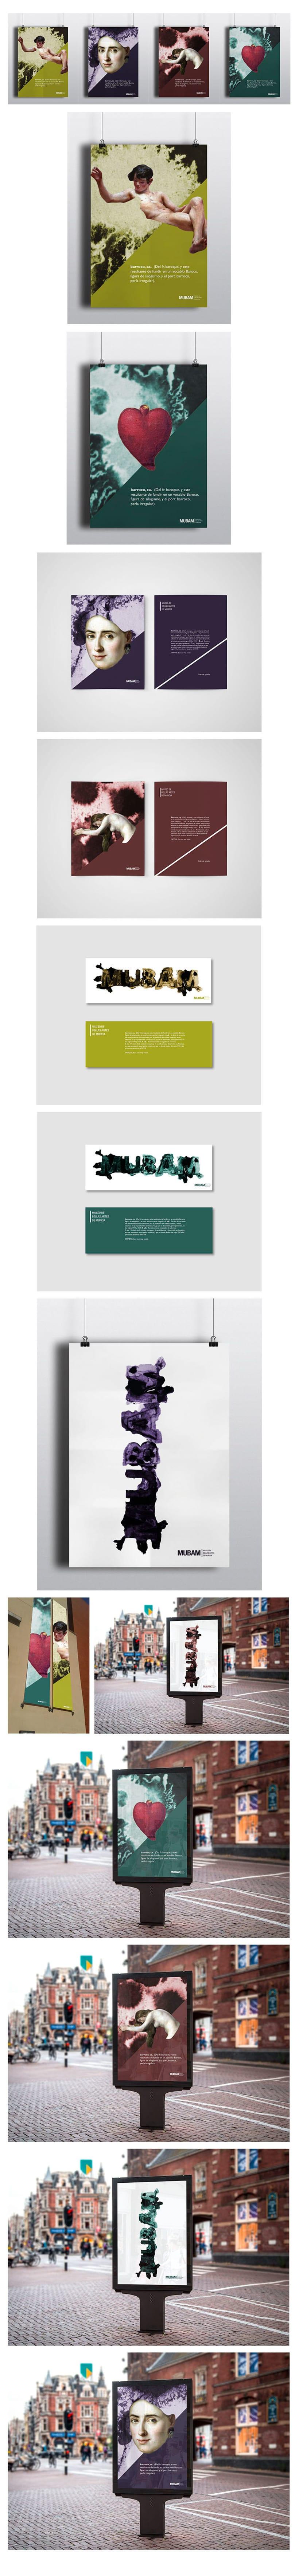 Museo MUBAM / Campaña publicitaria. 1